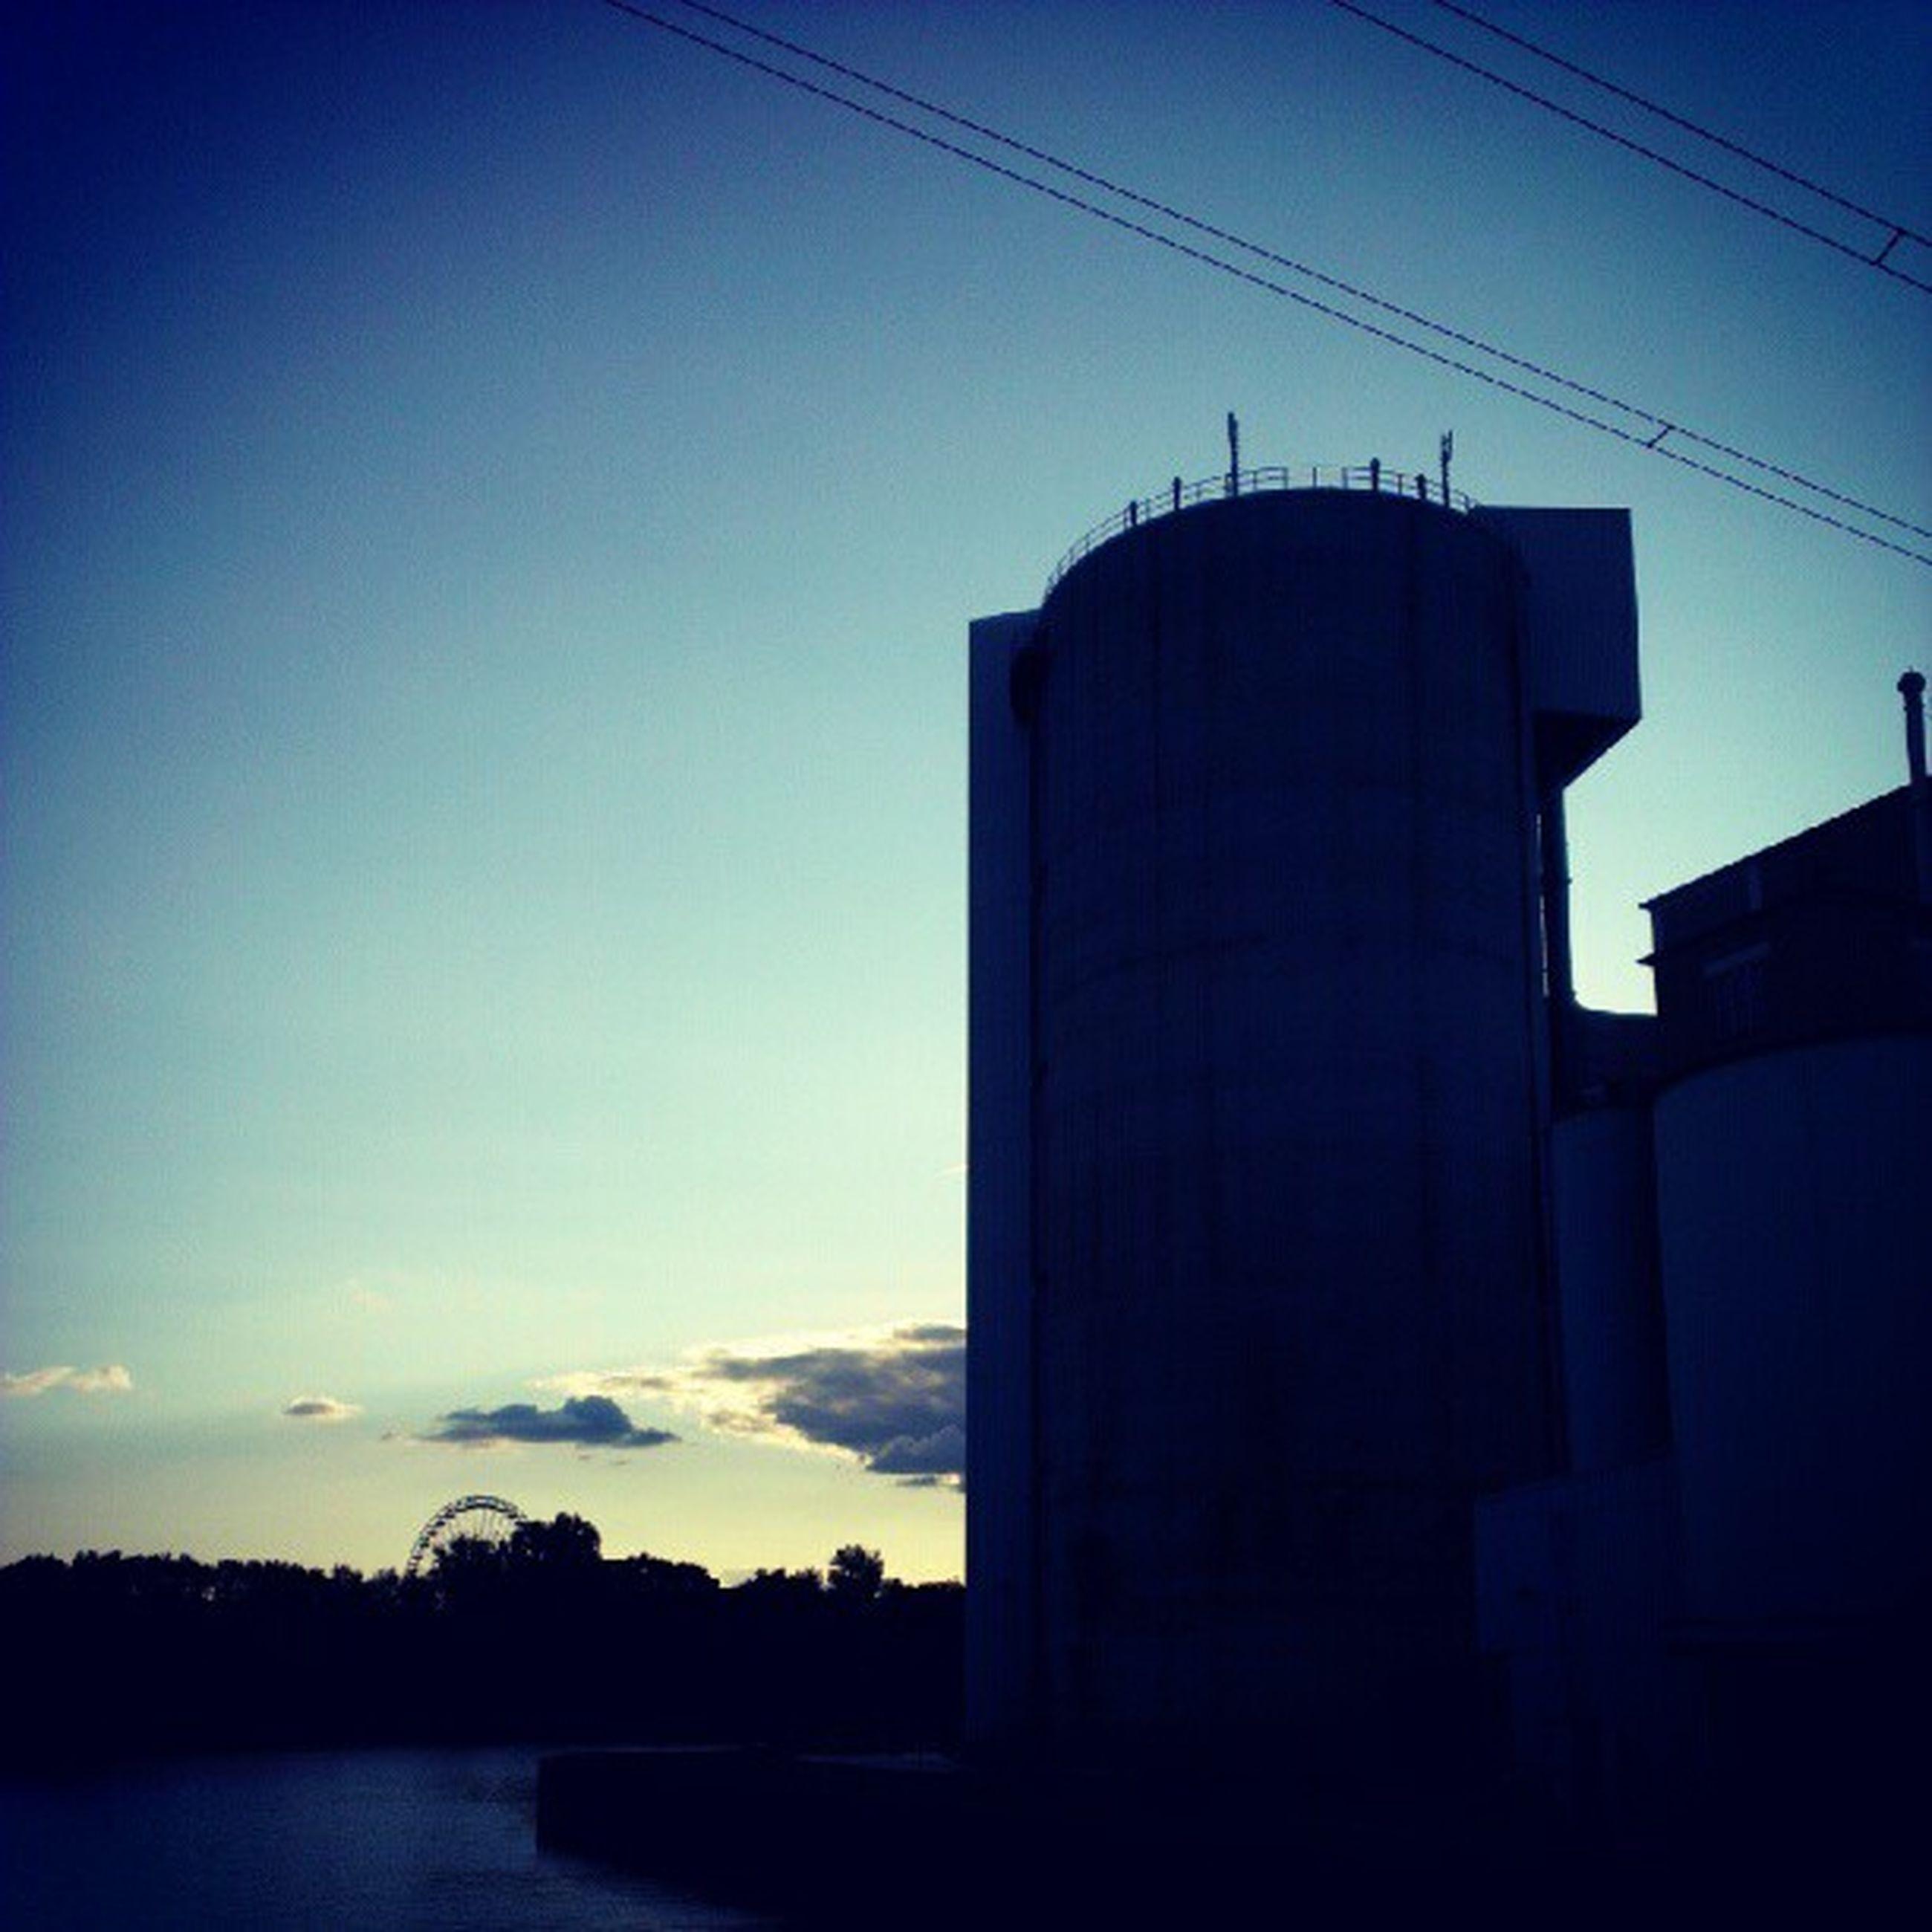 silhouette, architecture, built structure, building exterior, sunset, sky, low angle view, dusk, blue, copy space, power line, clear sky, outdoors, no people, dark, building, connection, electricity pylon, outline, nature